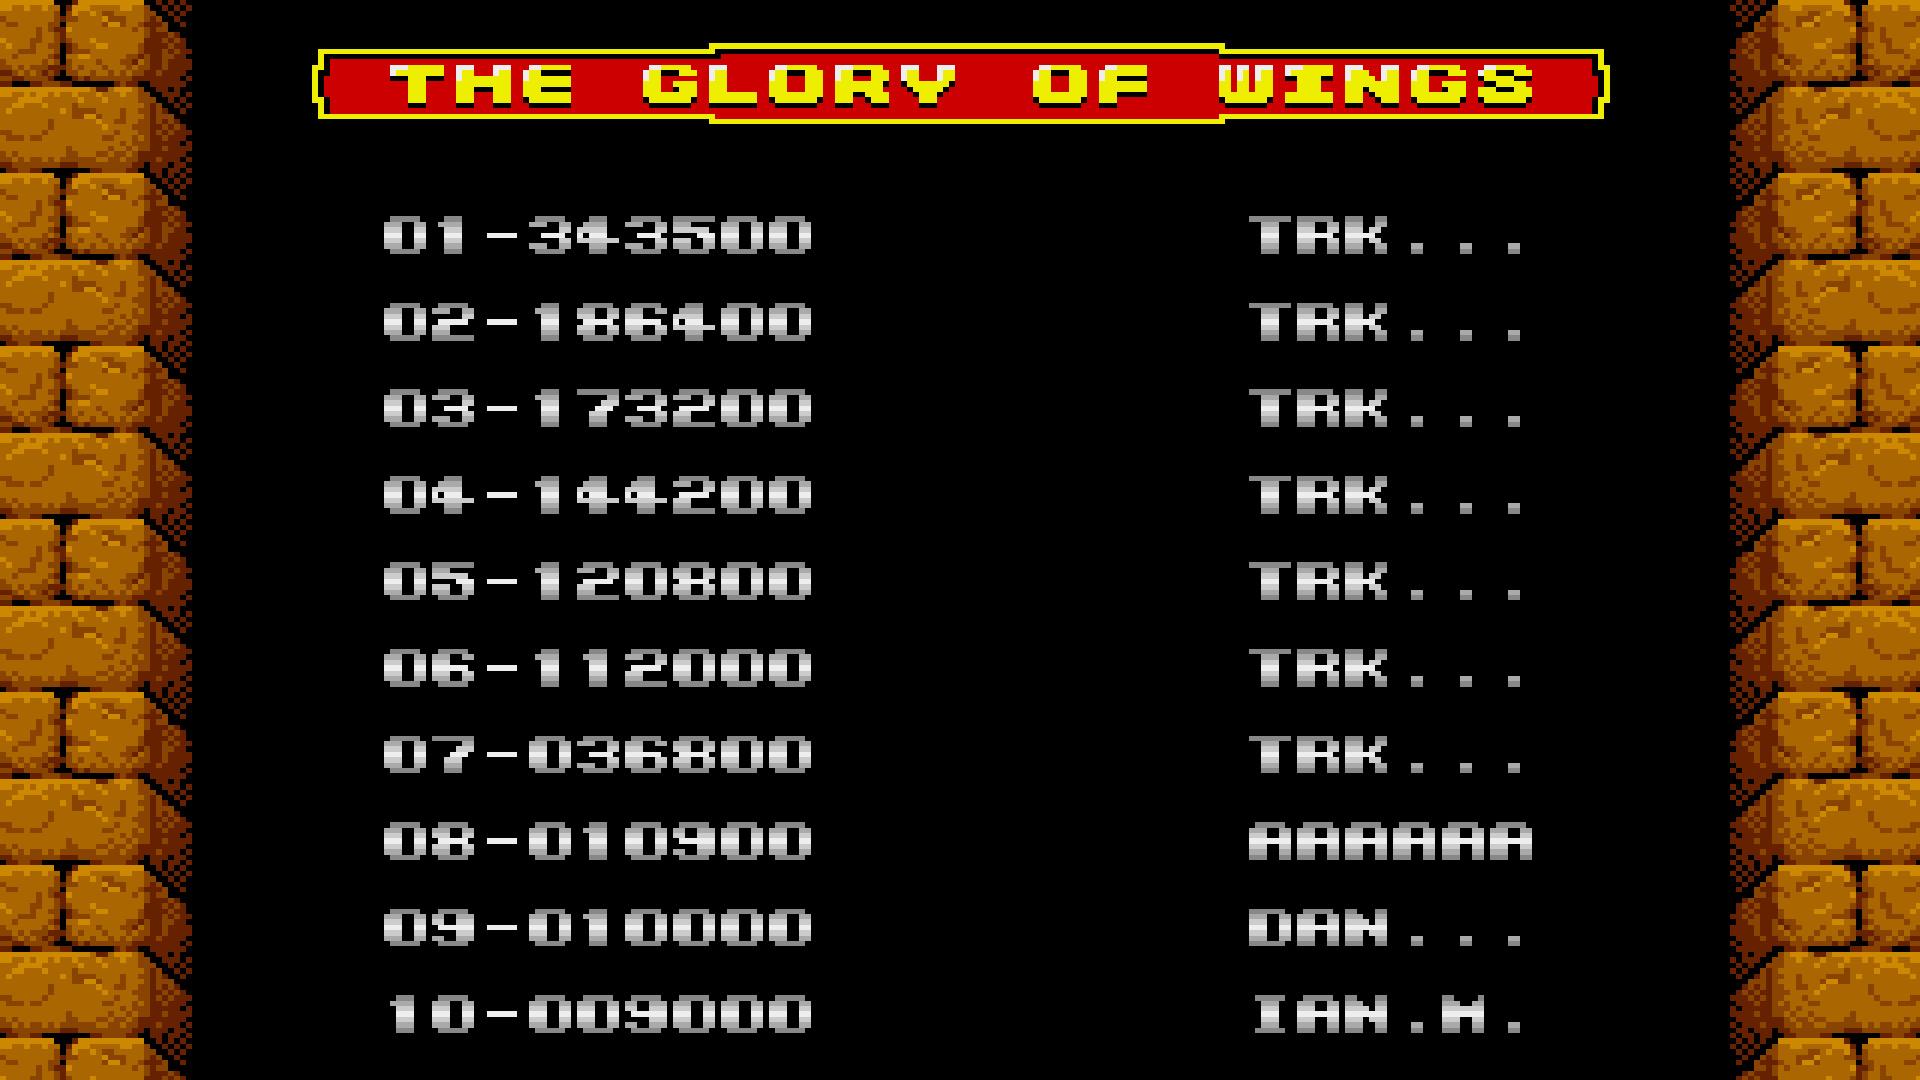 Gemini Wing 343,500 points